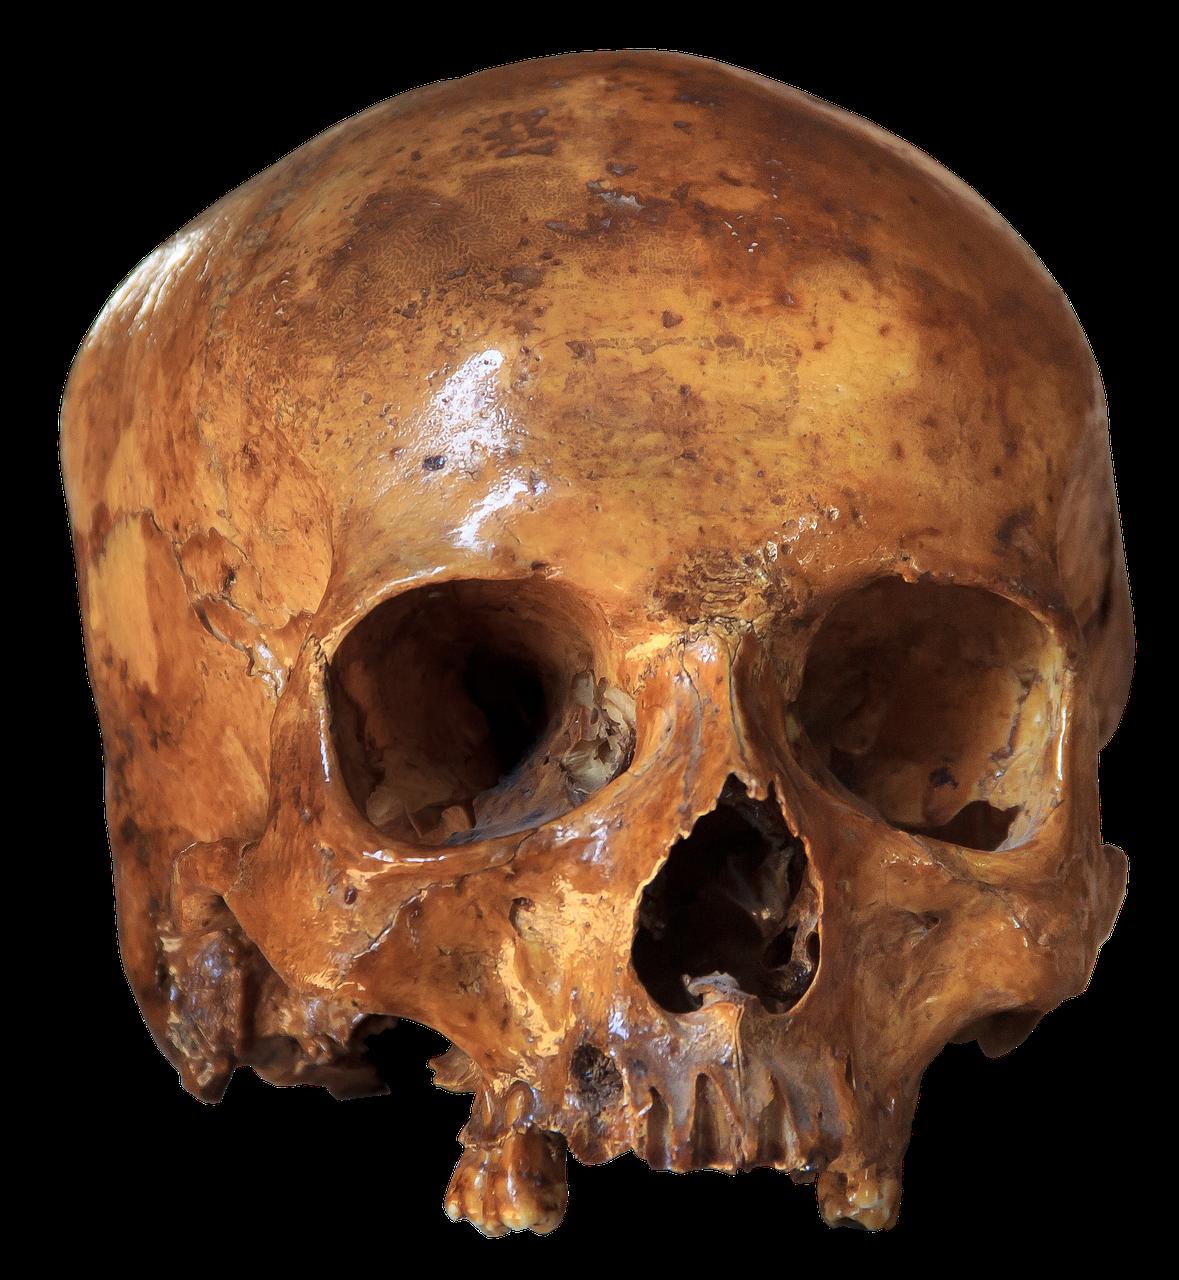 Skull,skeleton,bone,anatomy,brain skull - free photo from needpix.com